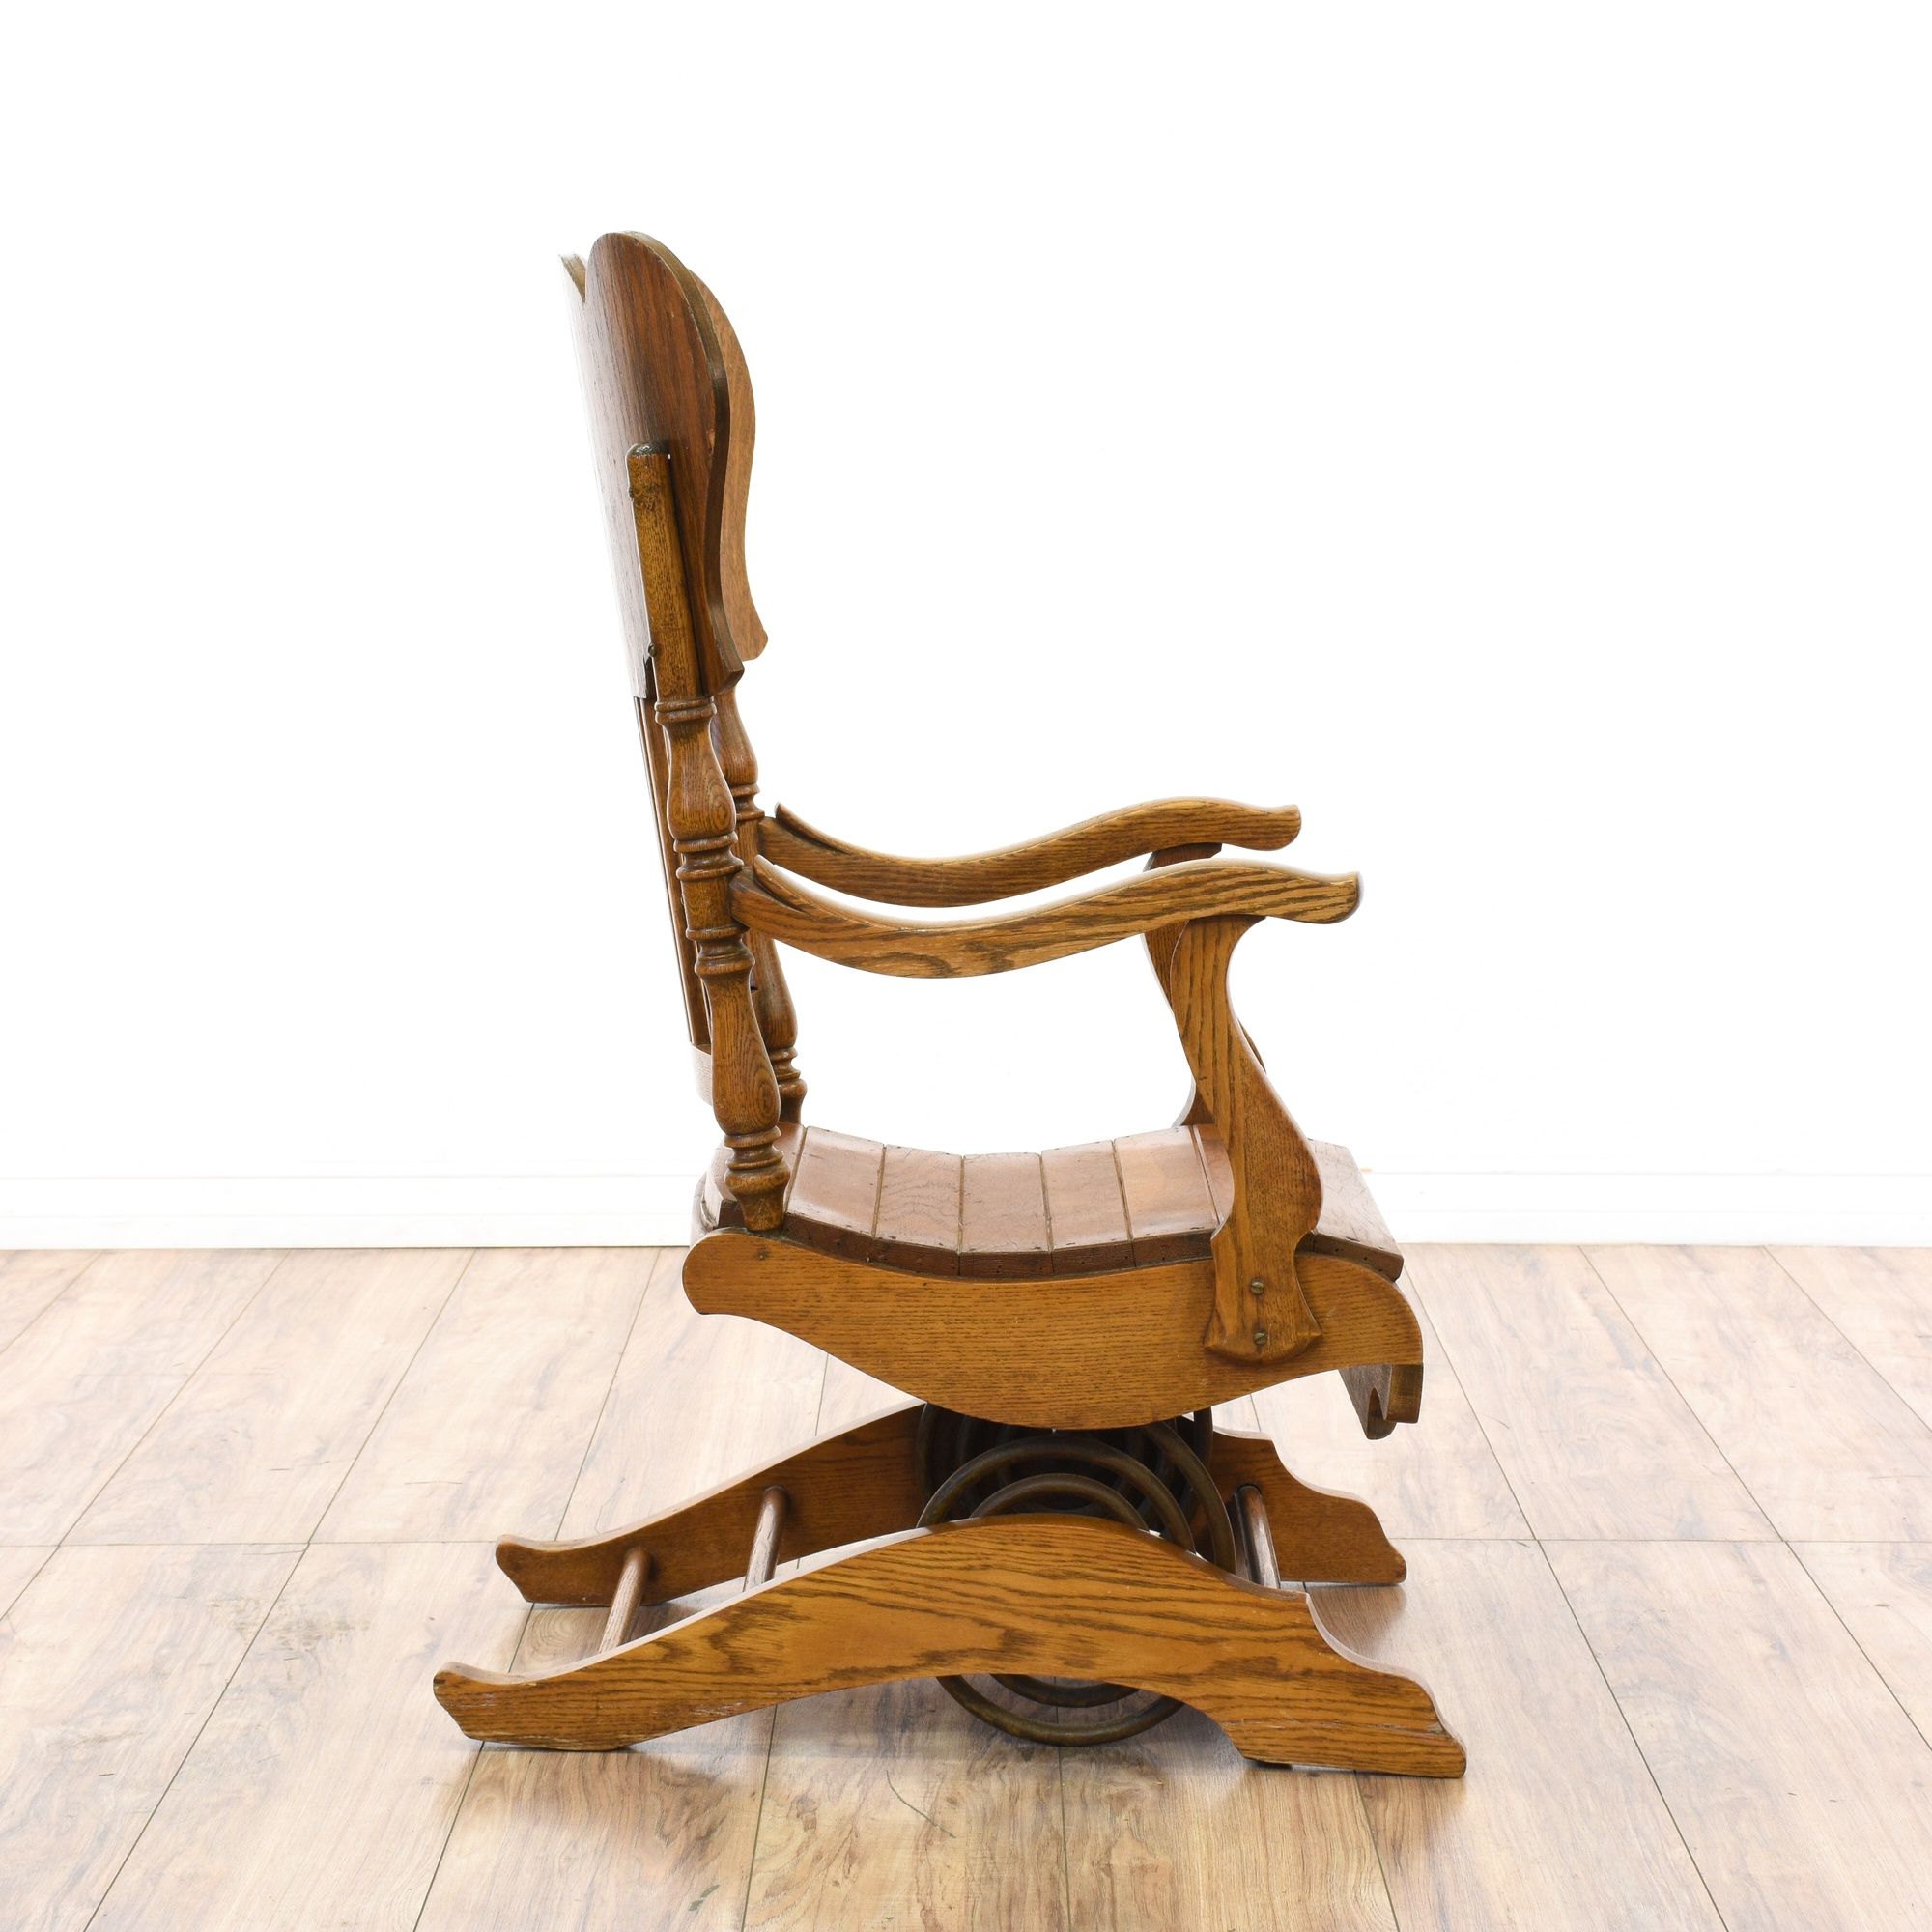 Antique carved rocking chair loveseat vintage furniture